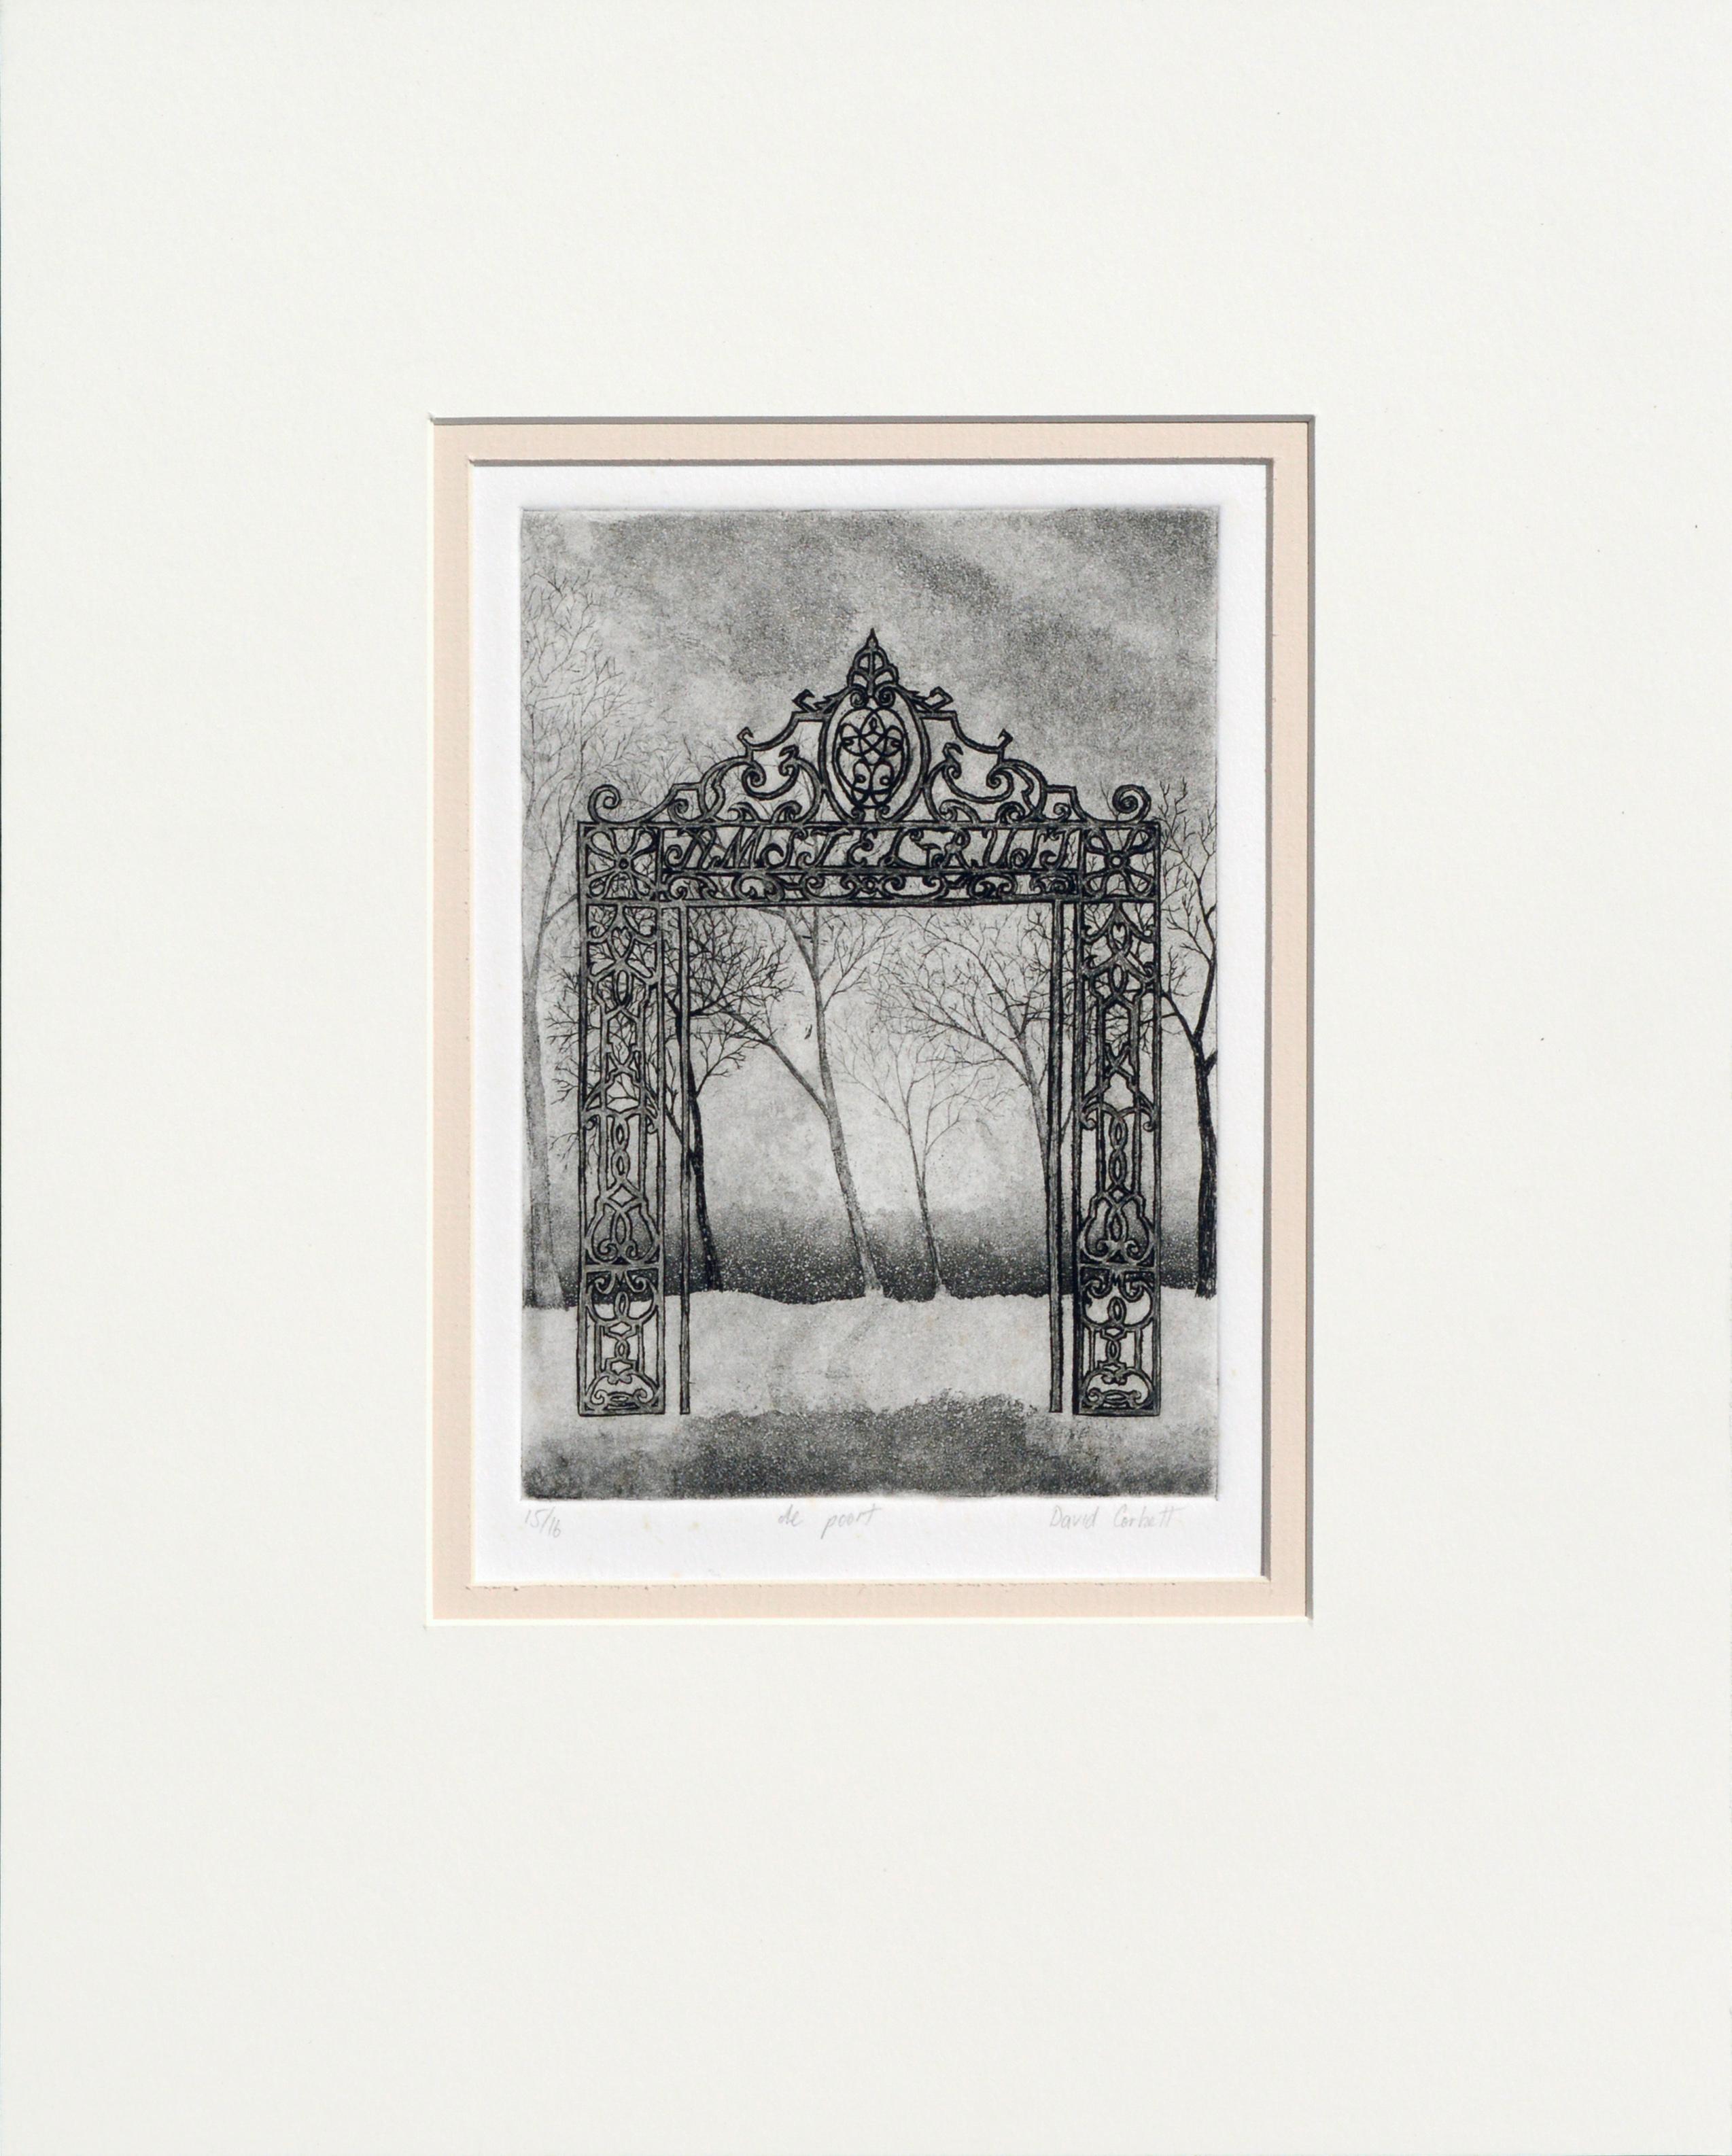 """de poort"" - The Gate Lithograph"